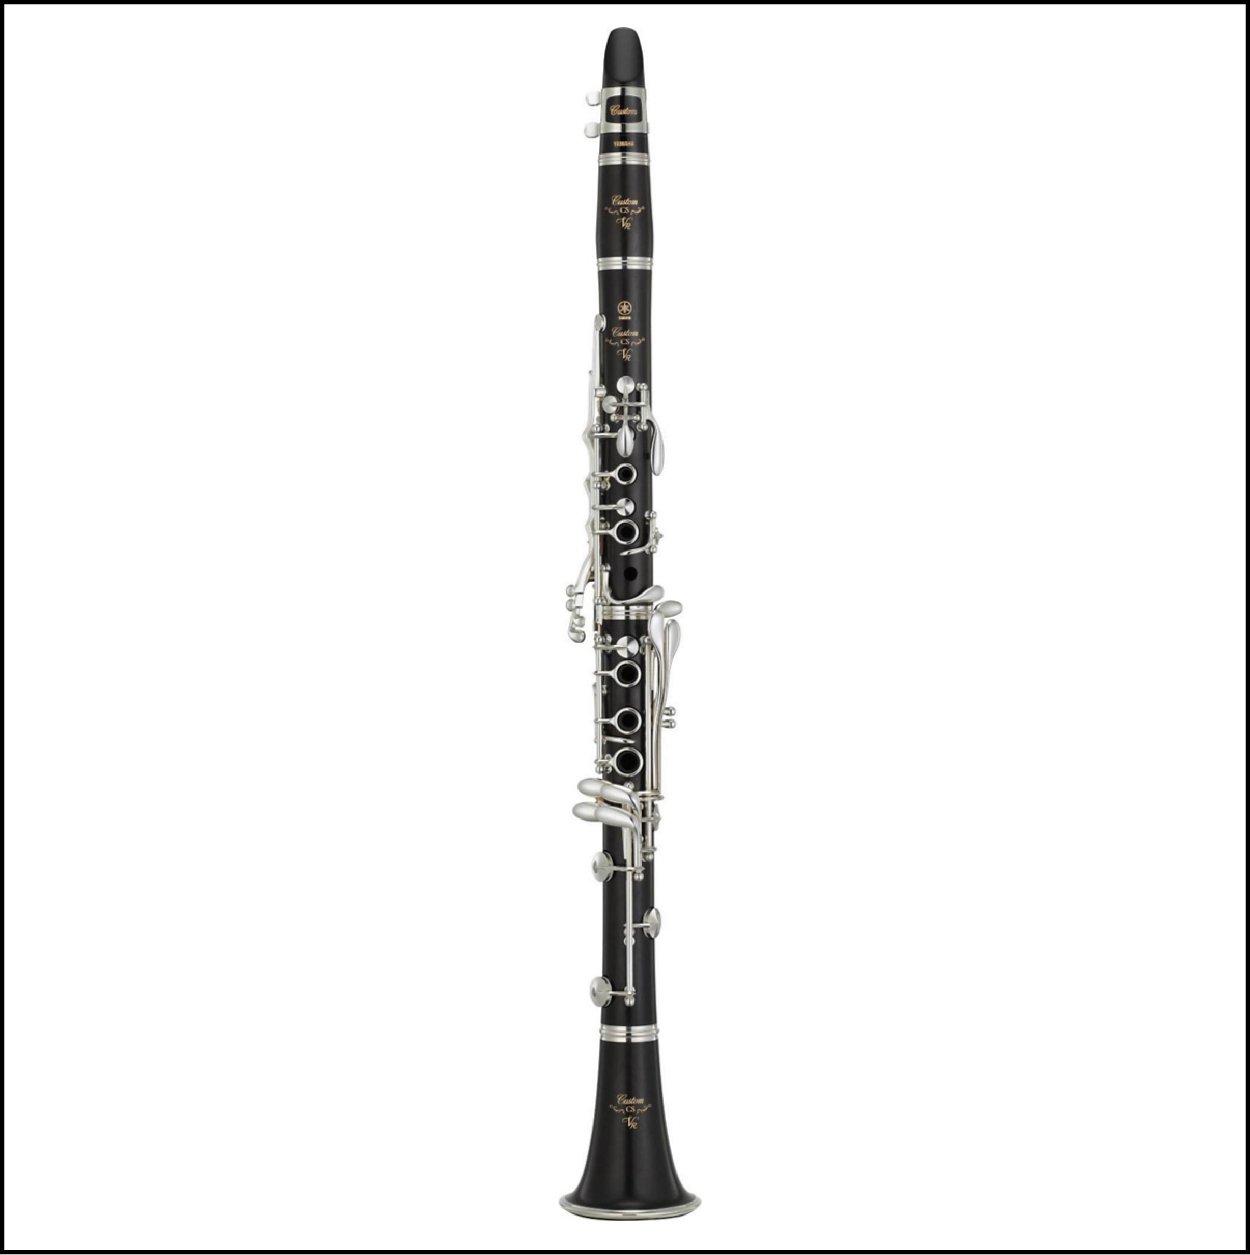 Yamaha CSVR Clarinet